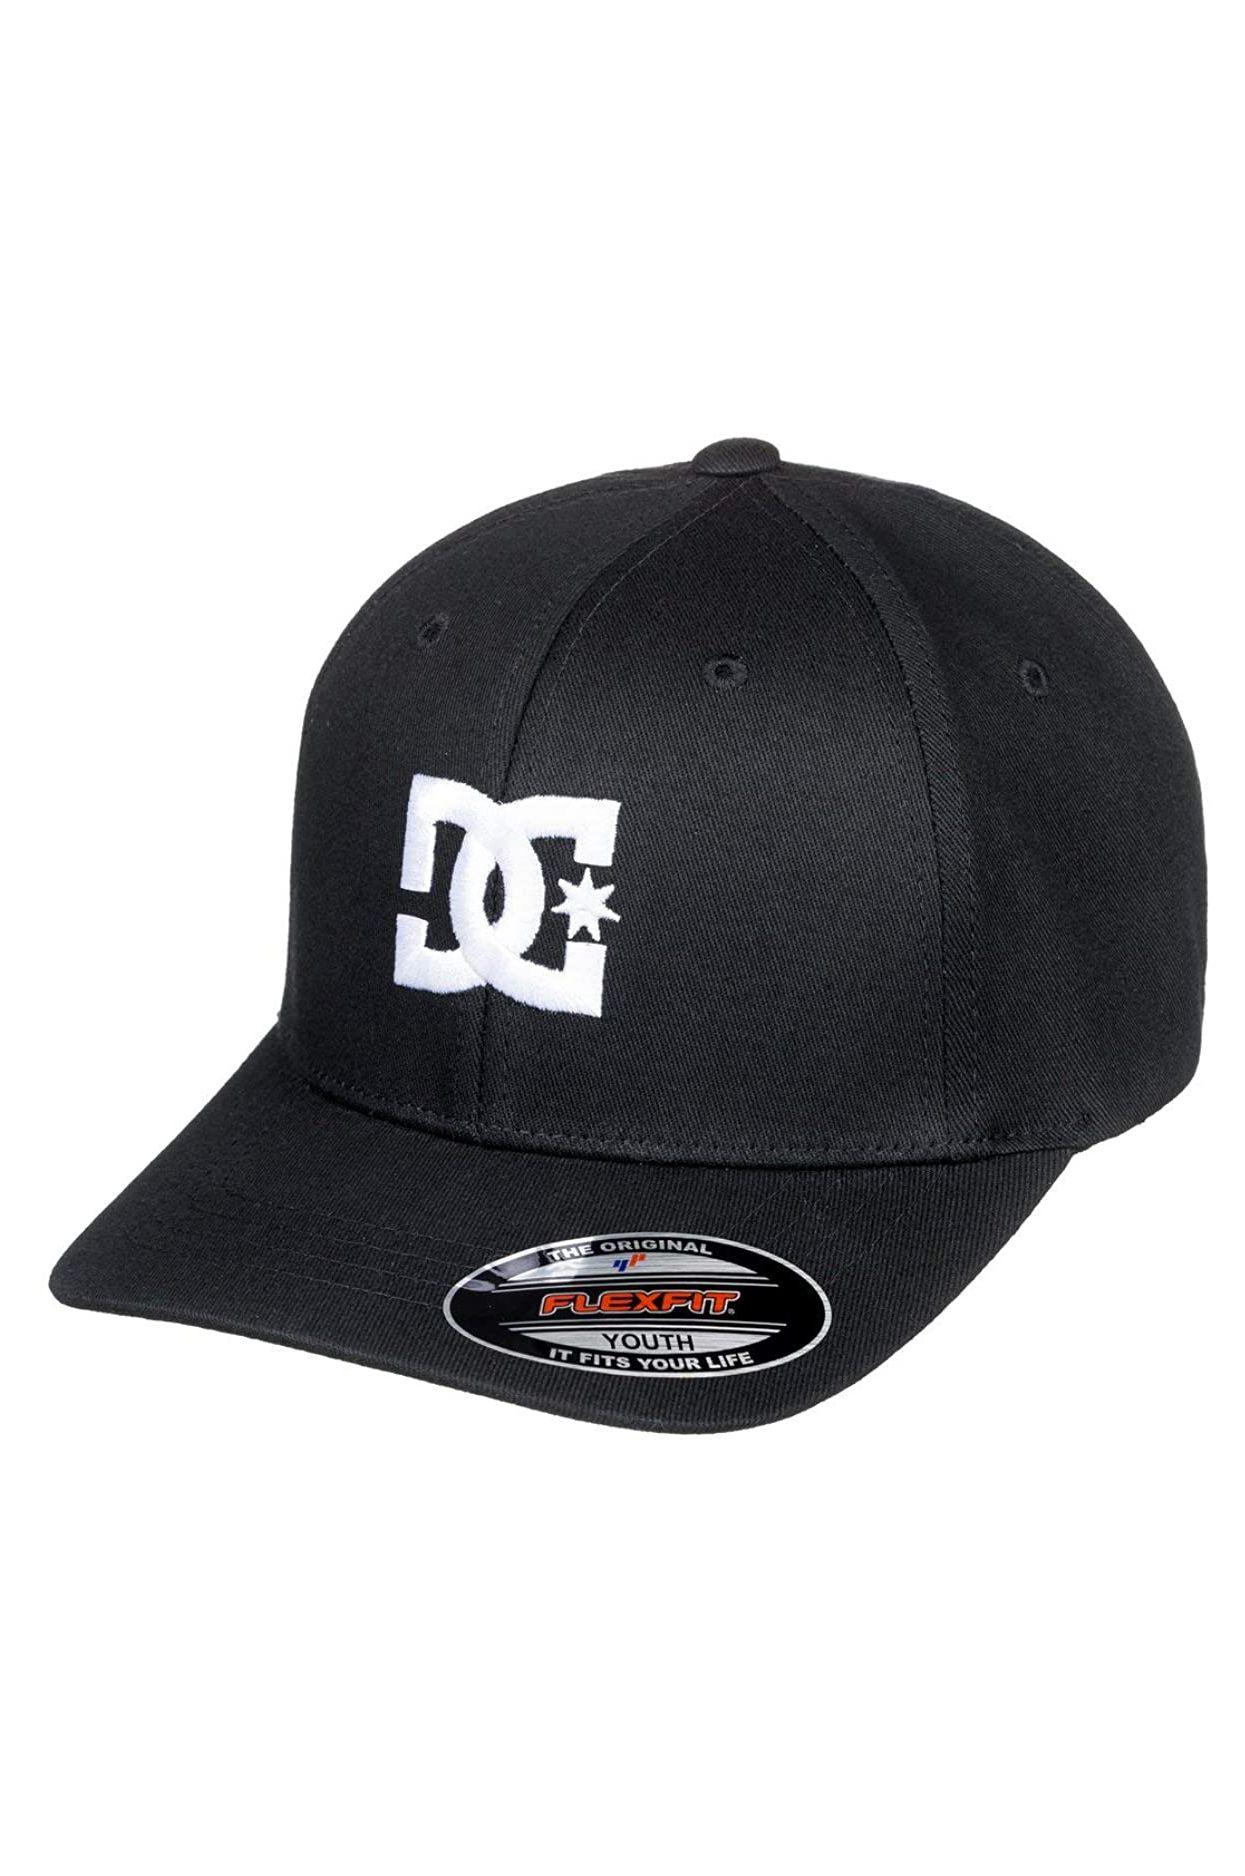 Bone DC Shoes CAP STAR 2 BY Black